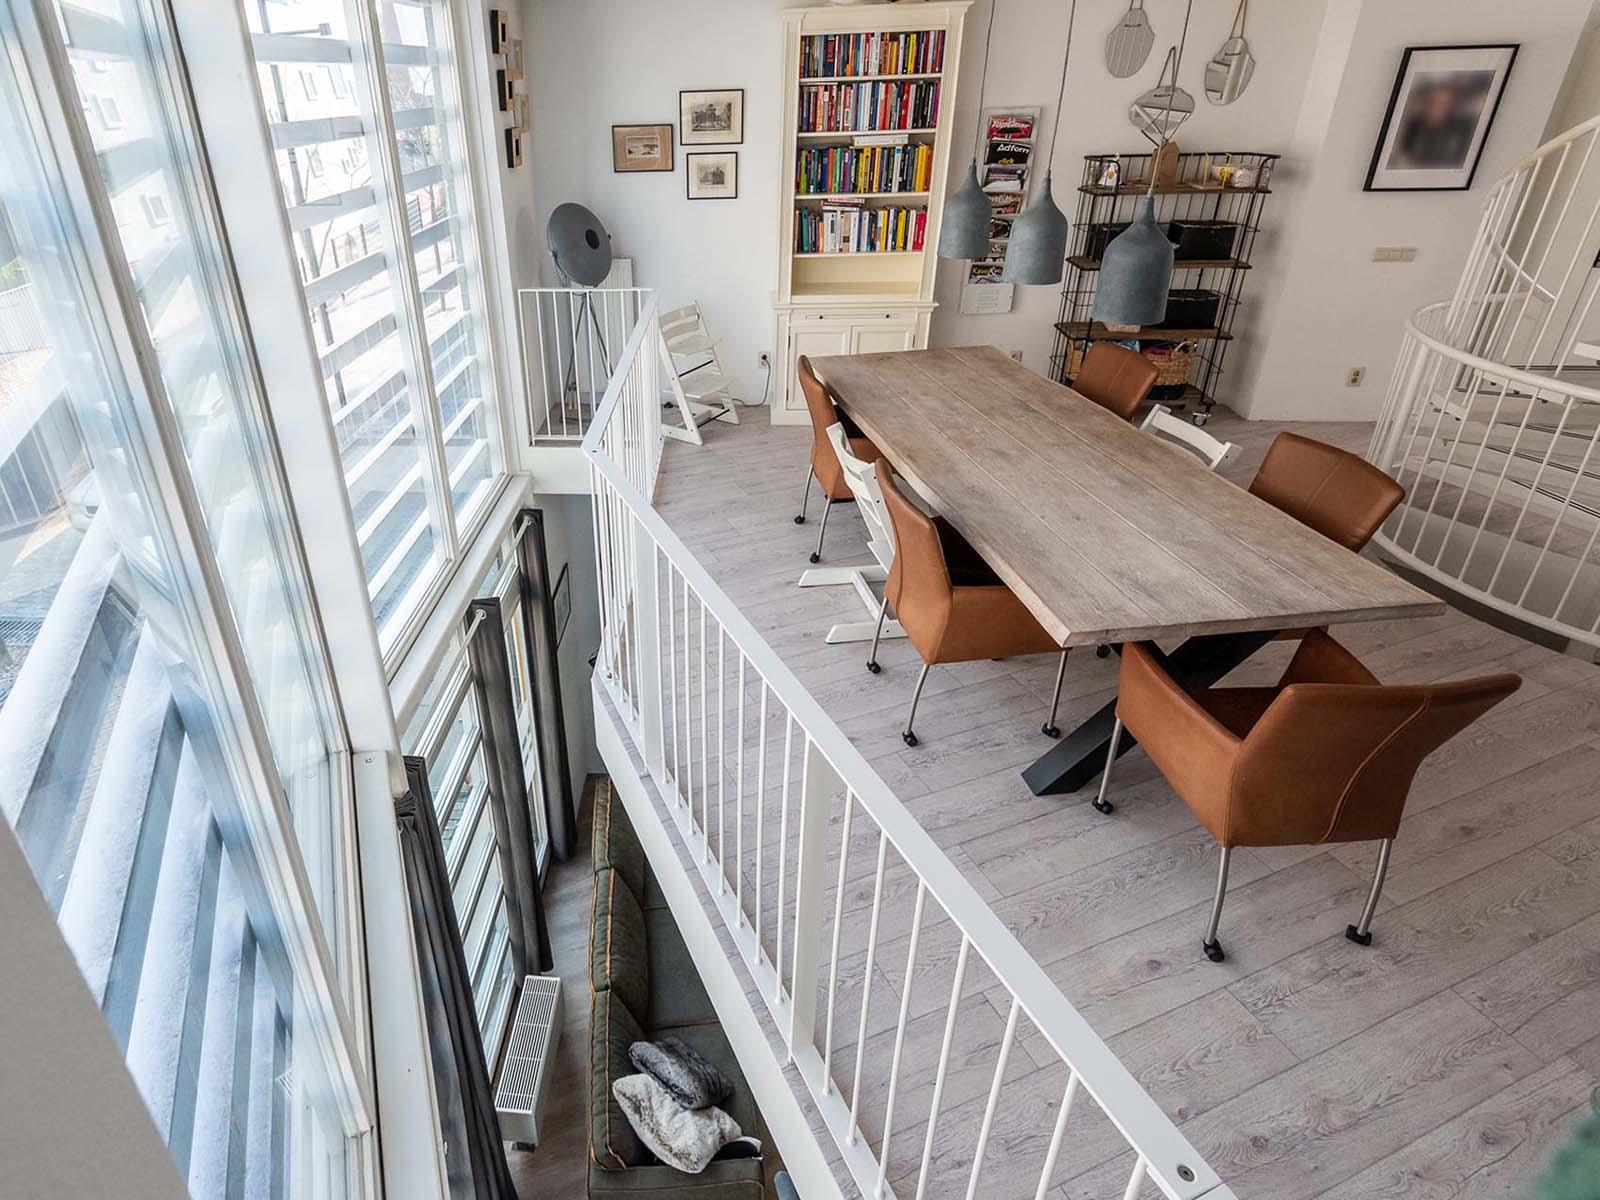 meubels-tafel-woning-interieur